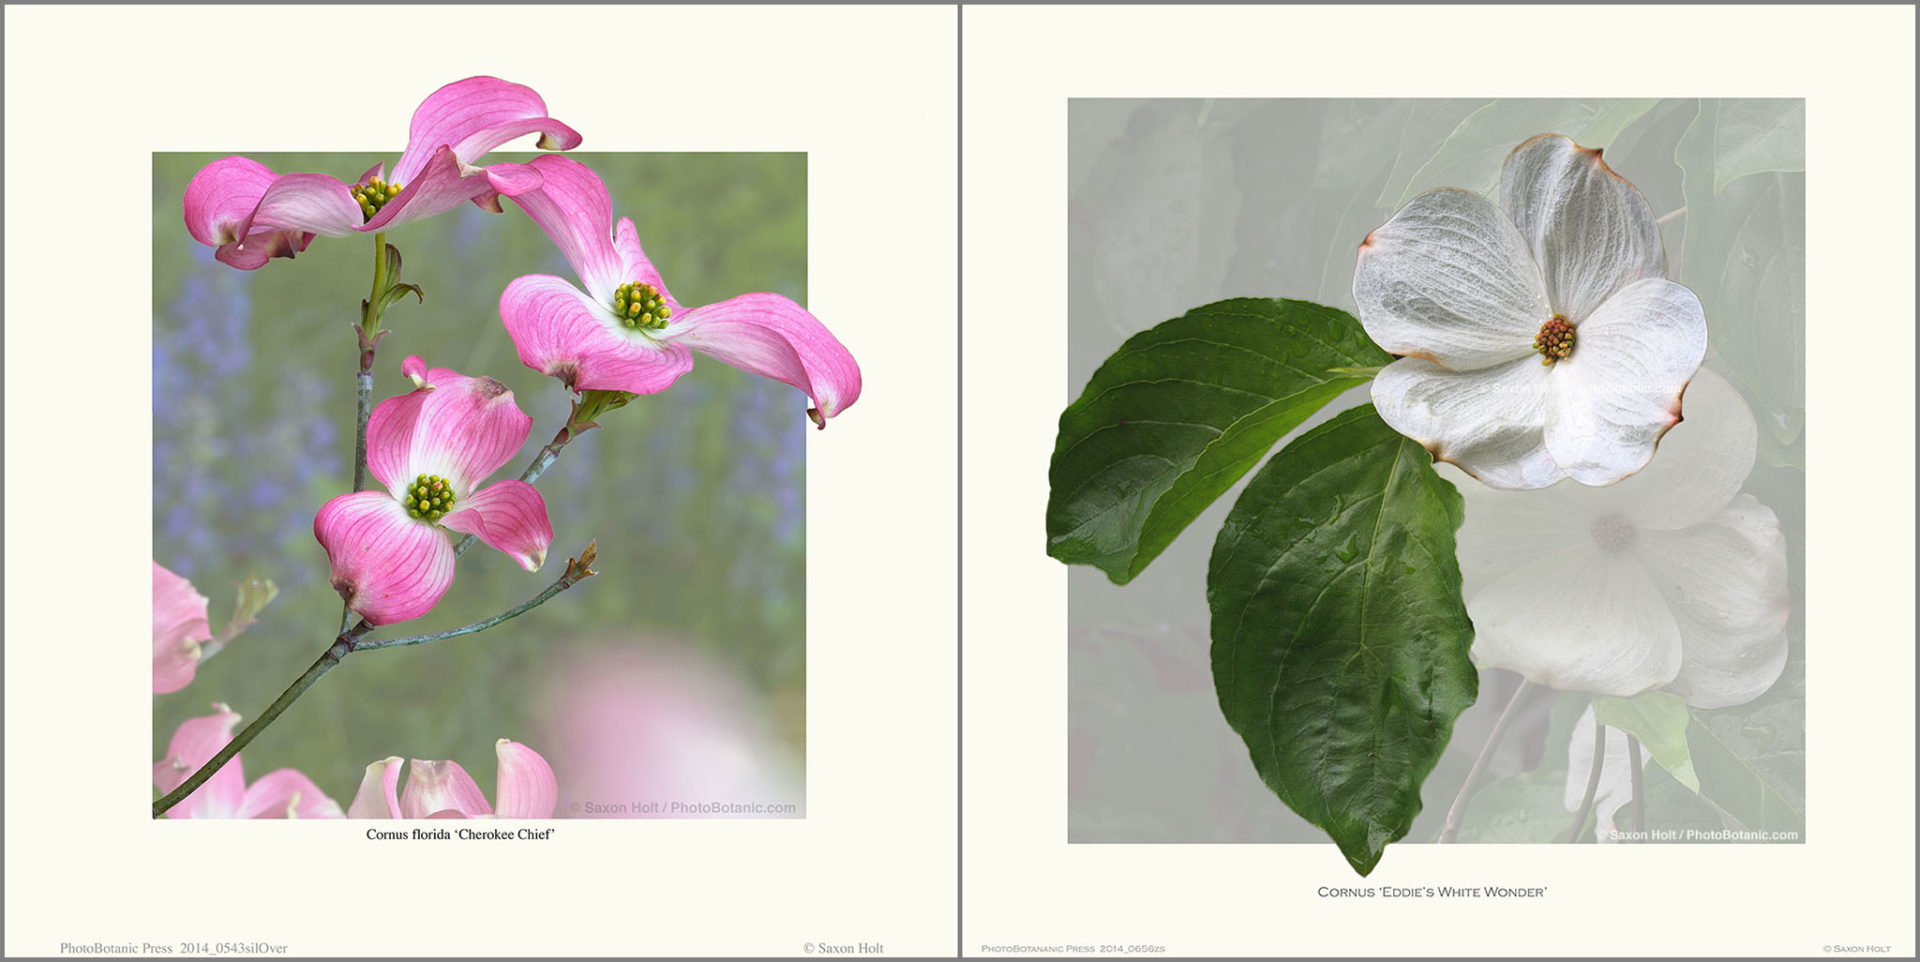 Cornus florida 'Cherokee Chief'; pink flowering dogwood tree branch in California garden